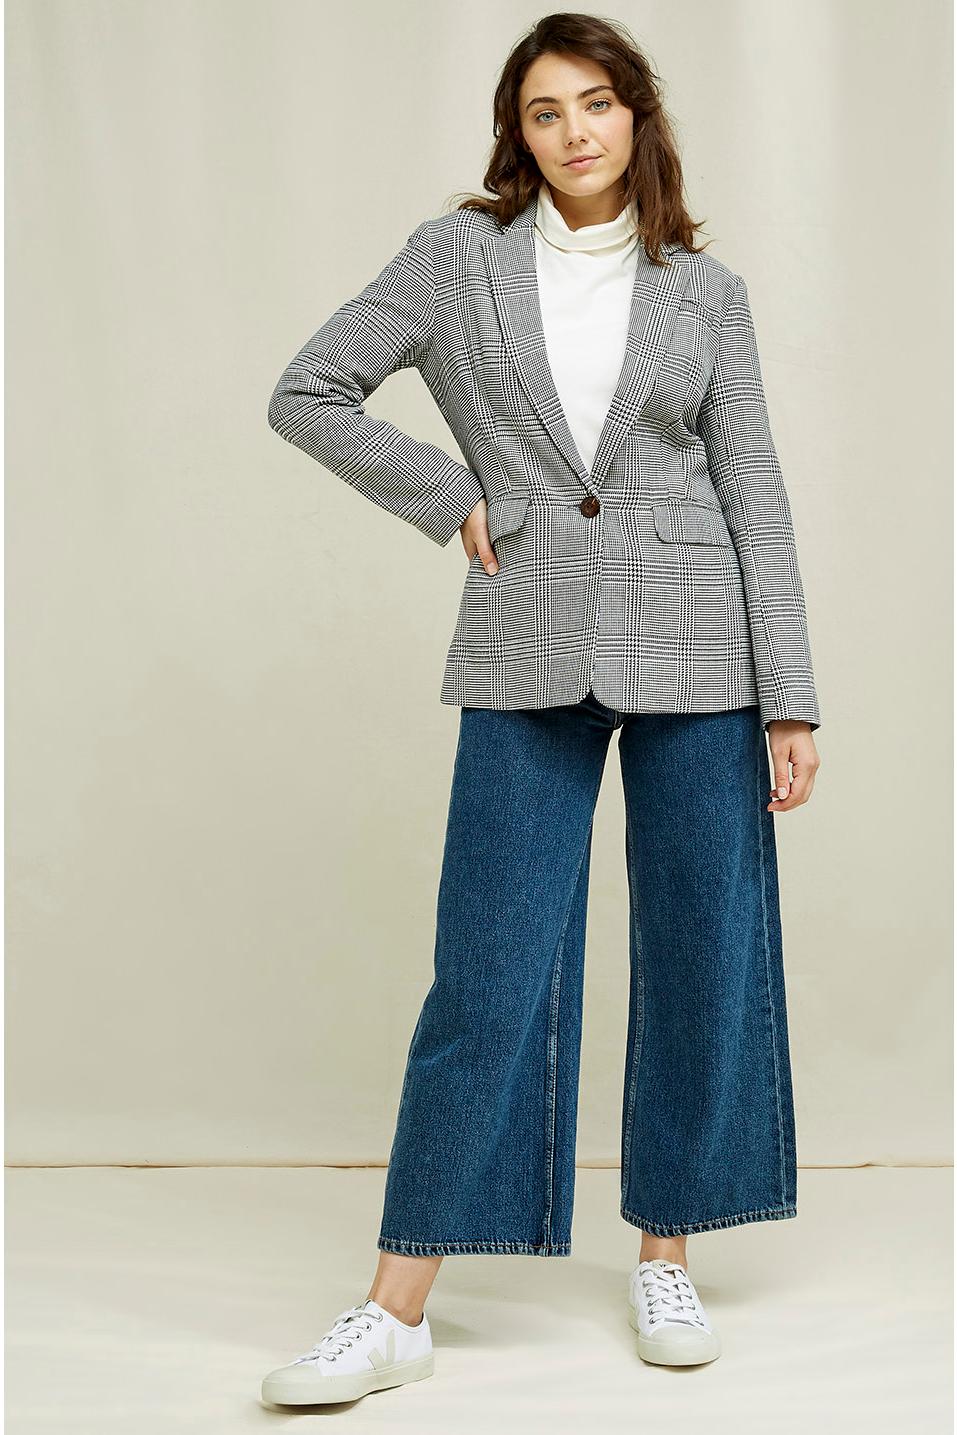 Roberta Organic Fashion Peopletree Blazer Mirren Checkered 8